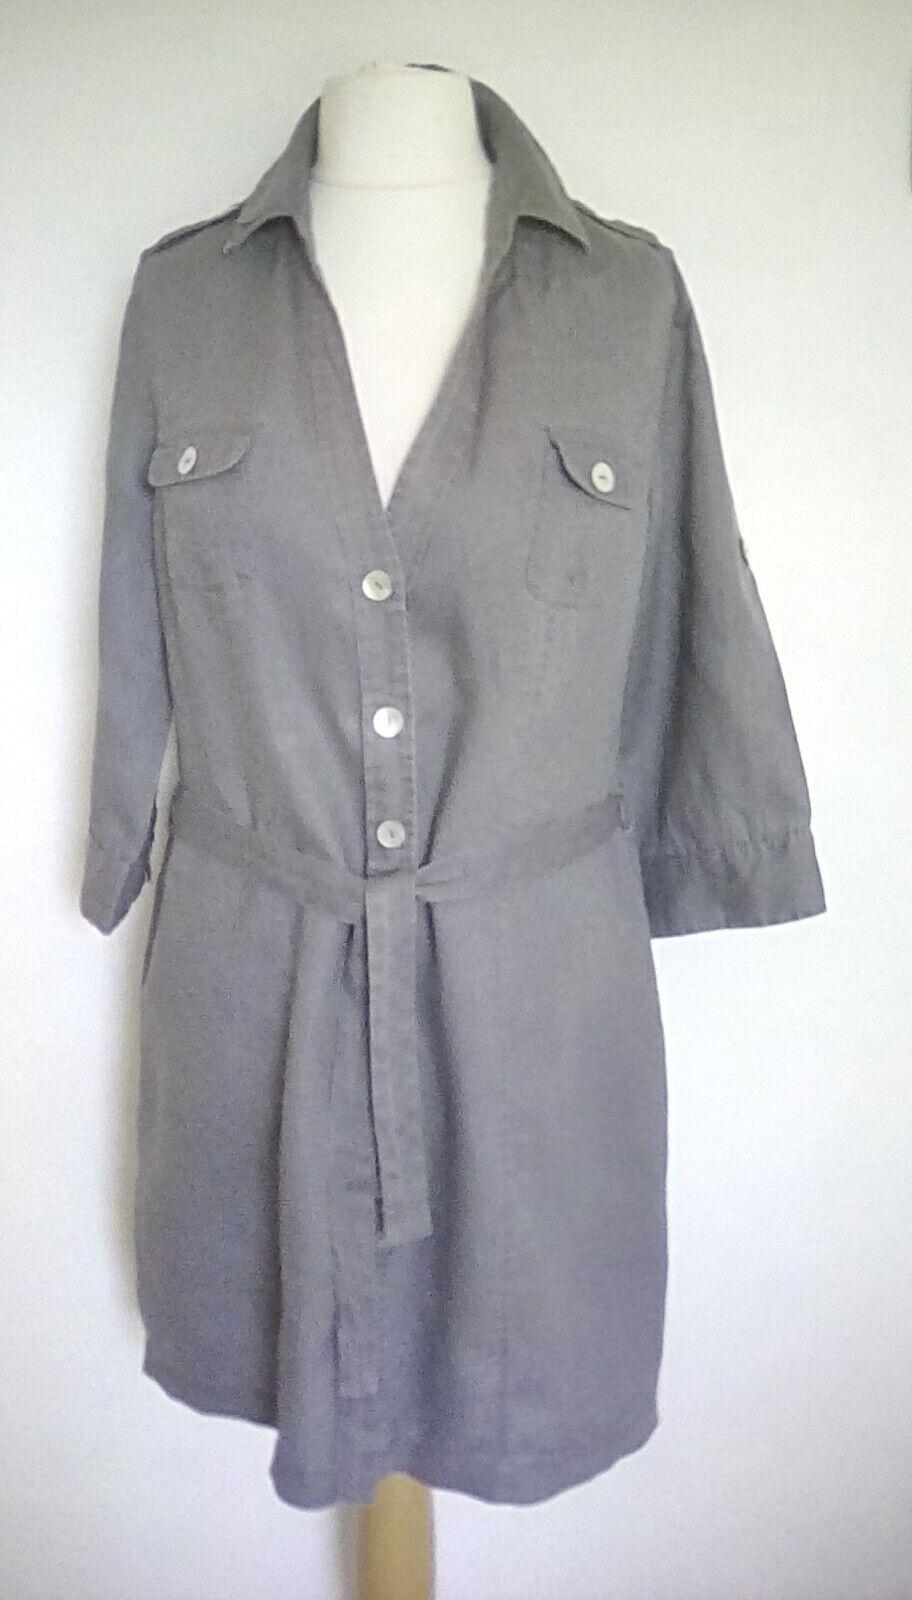 MALVIN UK 14 Linen shirt dress safari faded grey tie belt roll tab sleeve